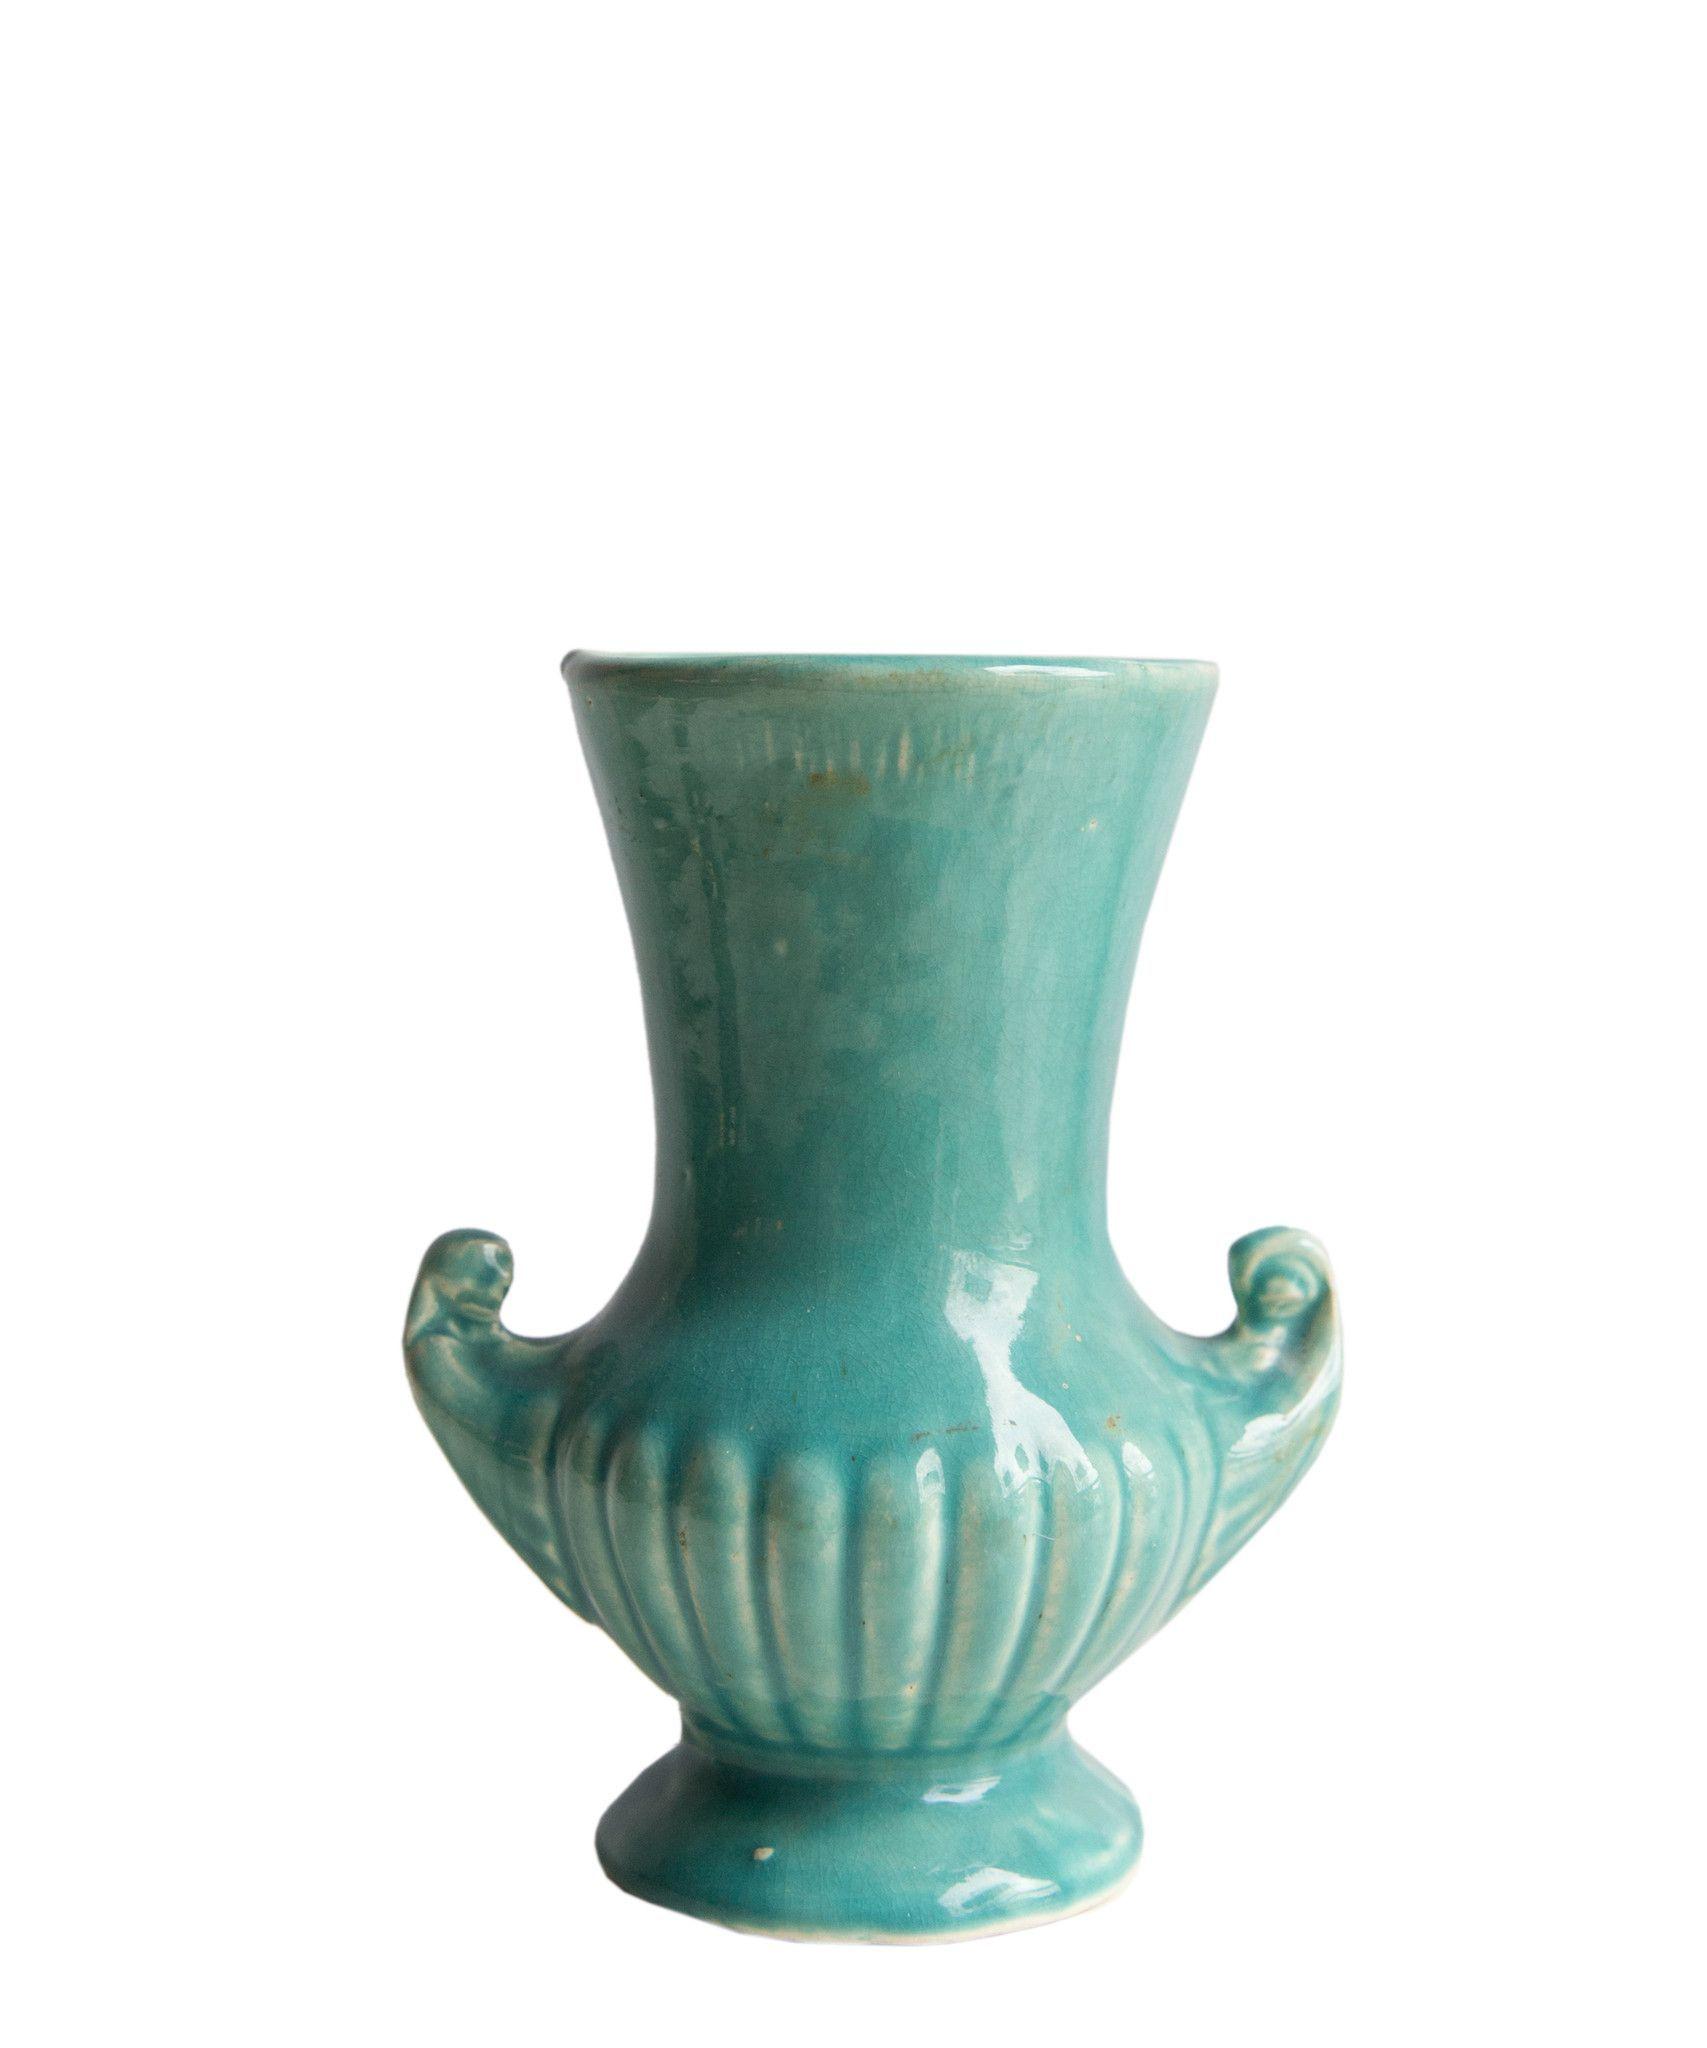 1940s vintage turquoise mccoy vase passion fo r pottery 1940s vintage turquoise mccoy vase reviewsmspy